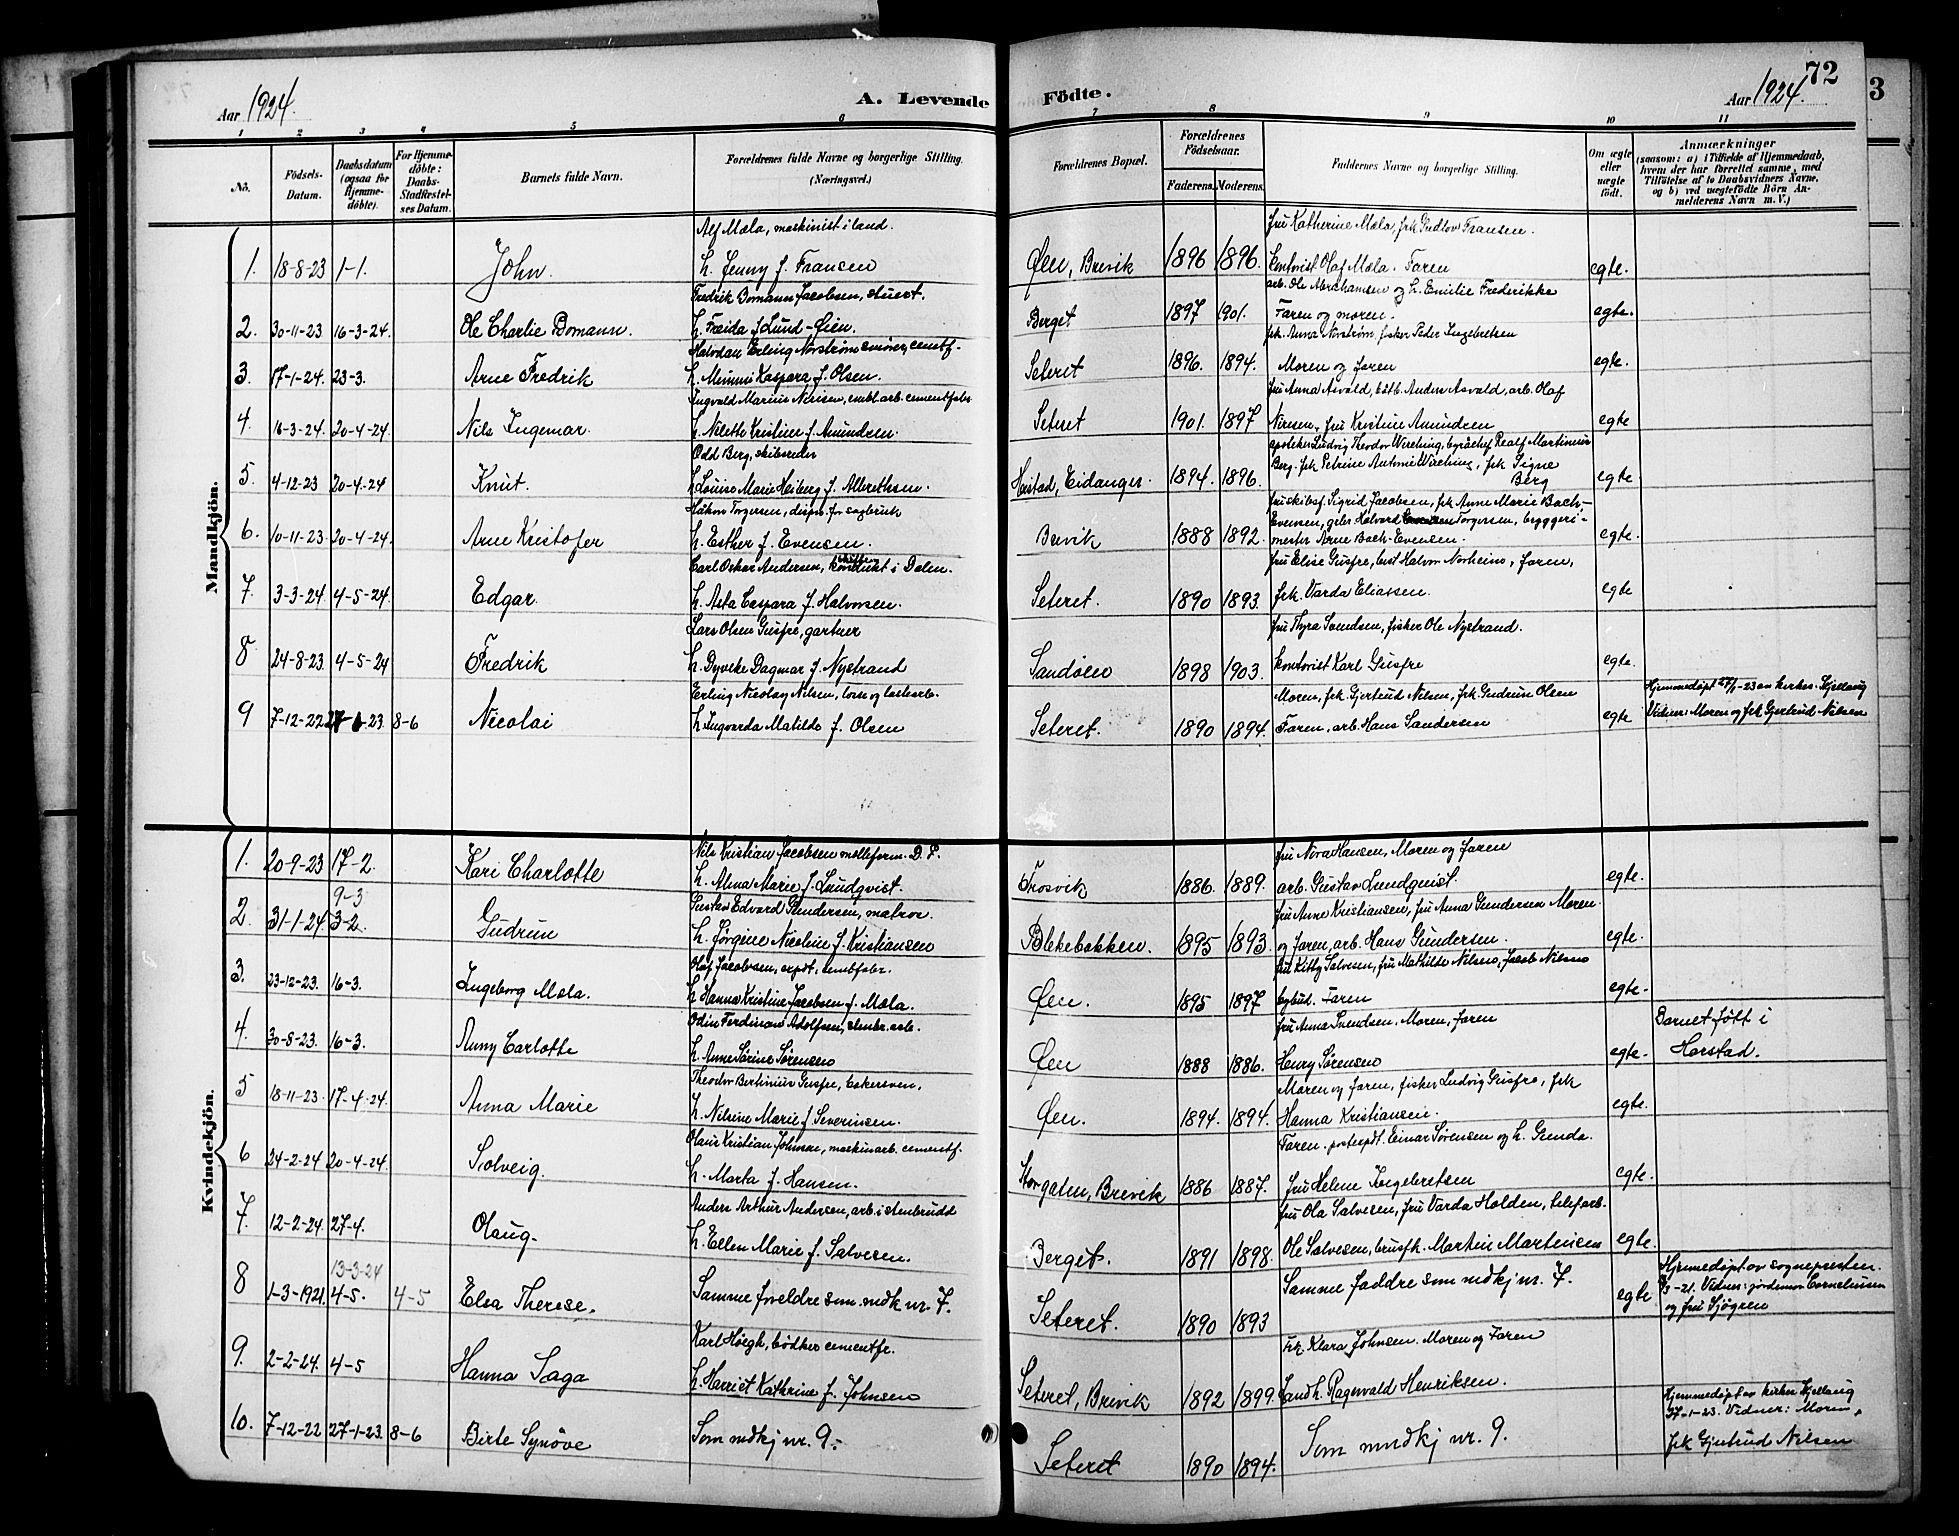 SAKO, Brevik kirkebøker, G/Ga/L0005: Klokkerbok nr. 5, 1901-1924, s. 72